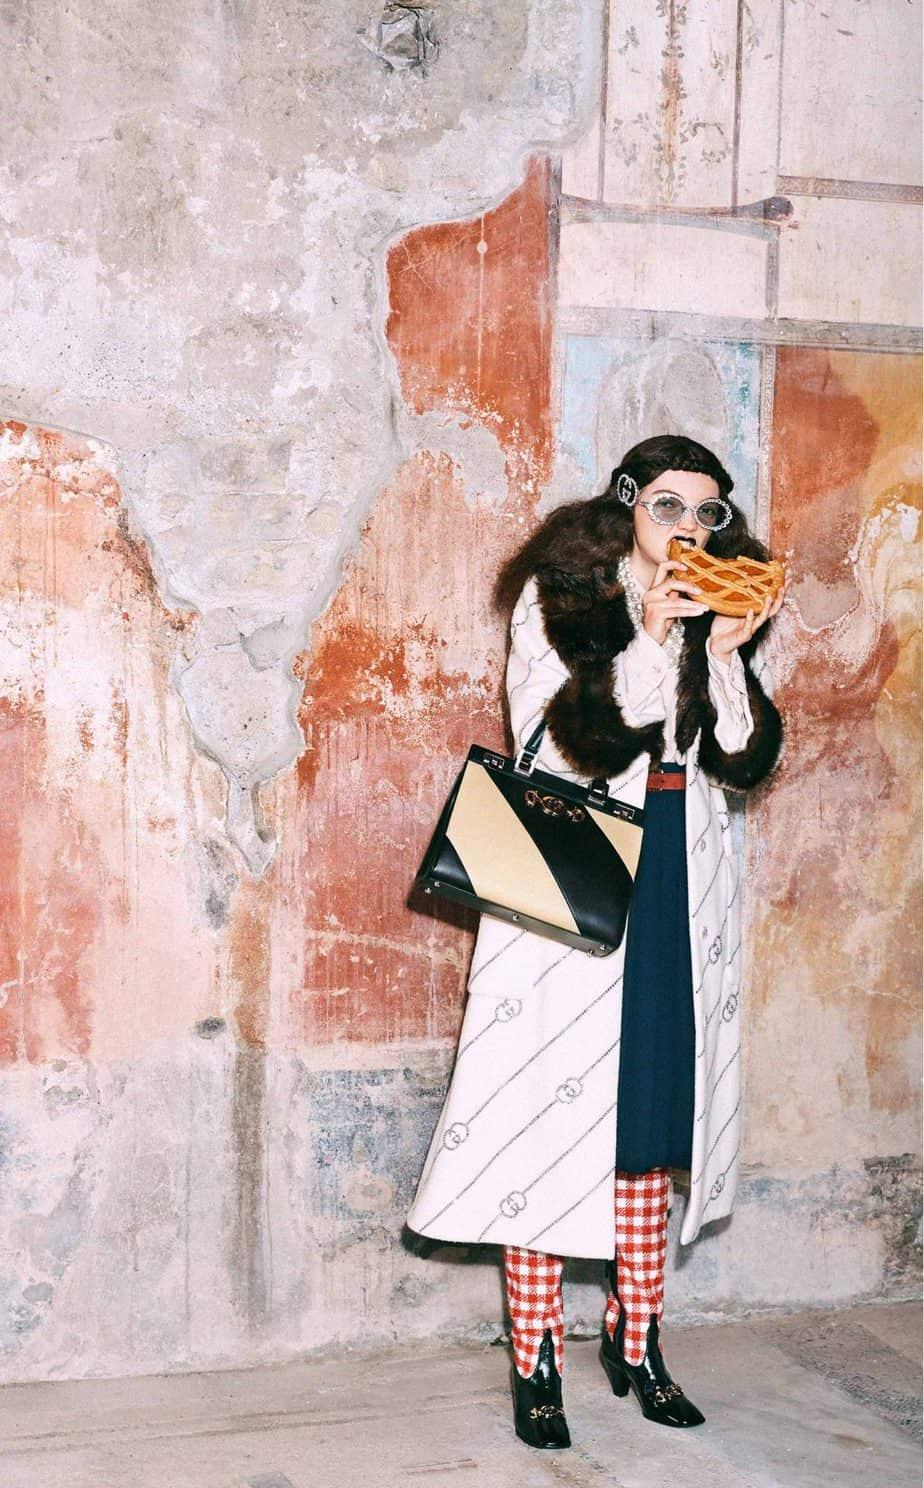 GUCCI, FALL 2019. WOMEN'S FASHION, Photographer Harmony Korine, Art Director, Christopher Simmonds - 75